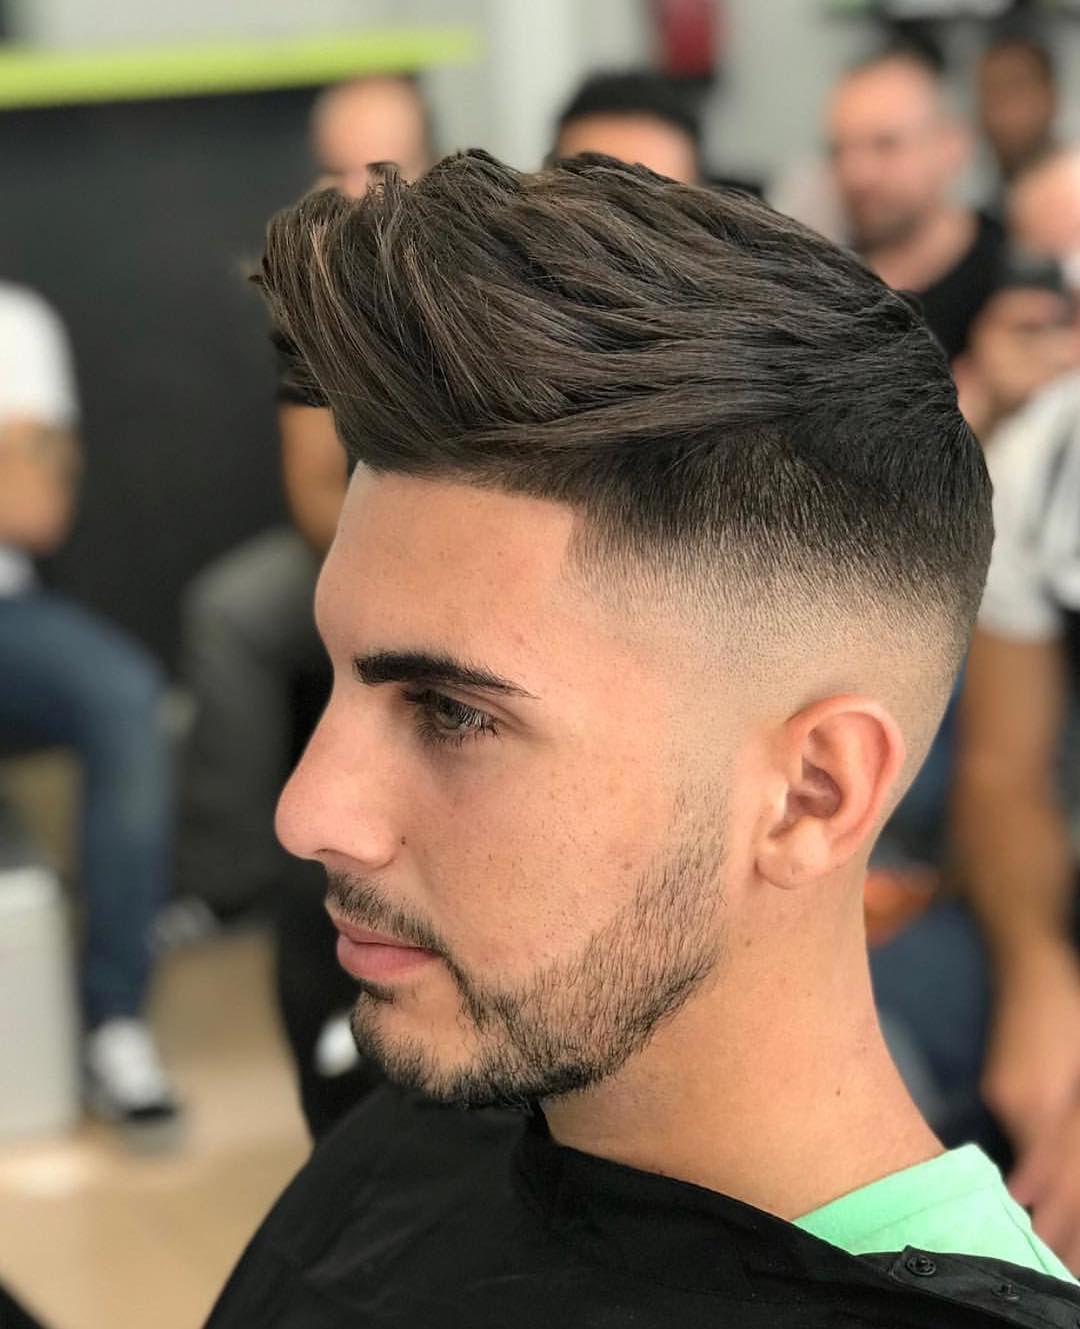 Bowl cut haircut men  simple regular clean cut haircuts for men  best hairstyles